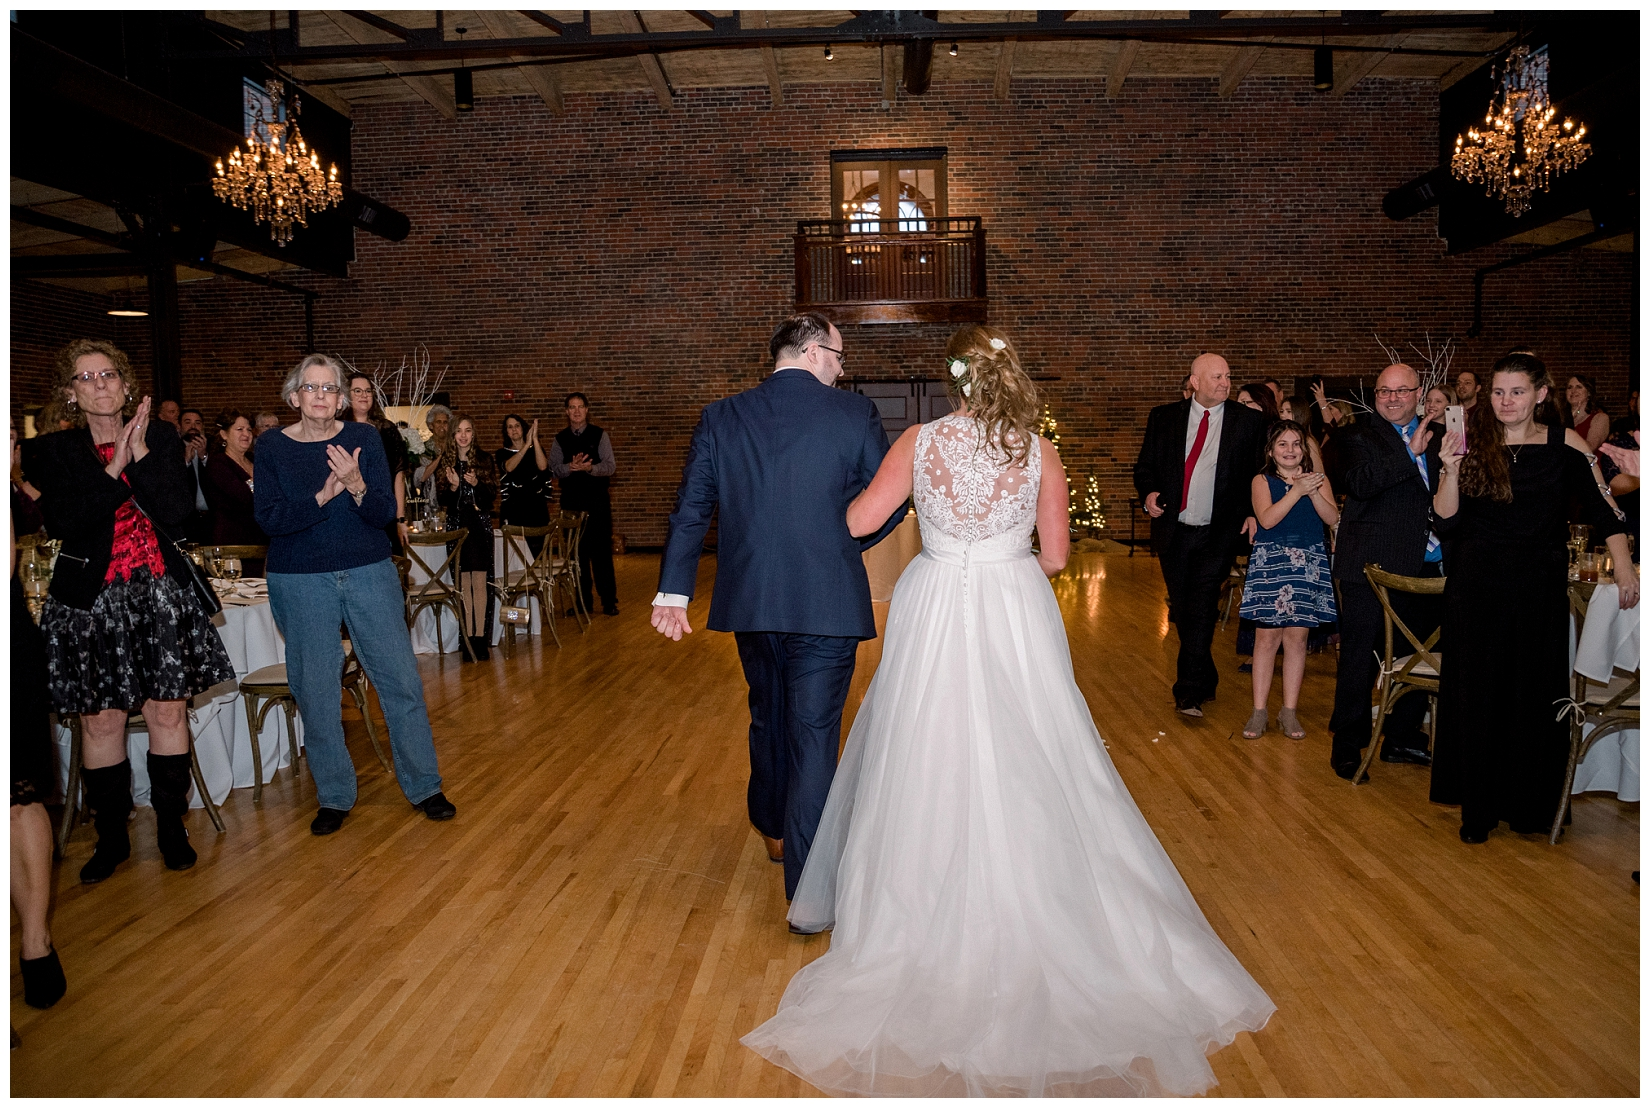 cat-alkire-wedding-photographer-indiana-chicago-indianapolis-fort-wayne_0990.jpg